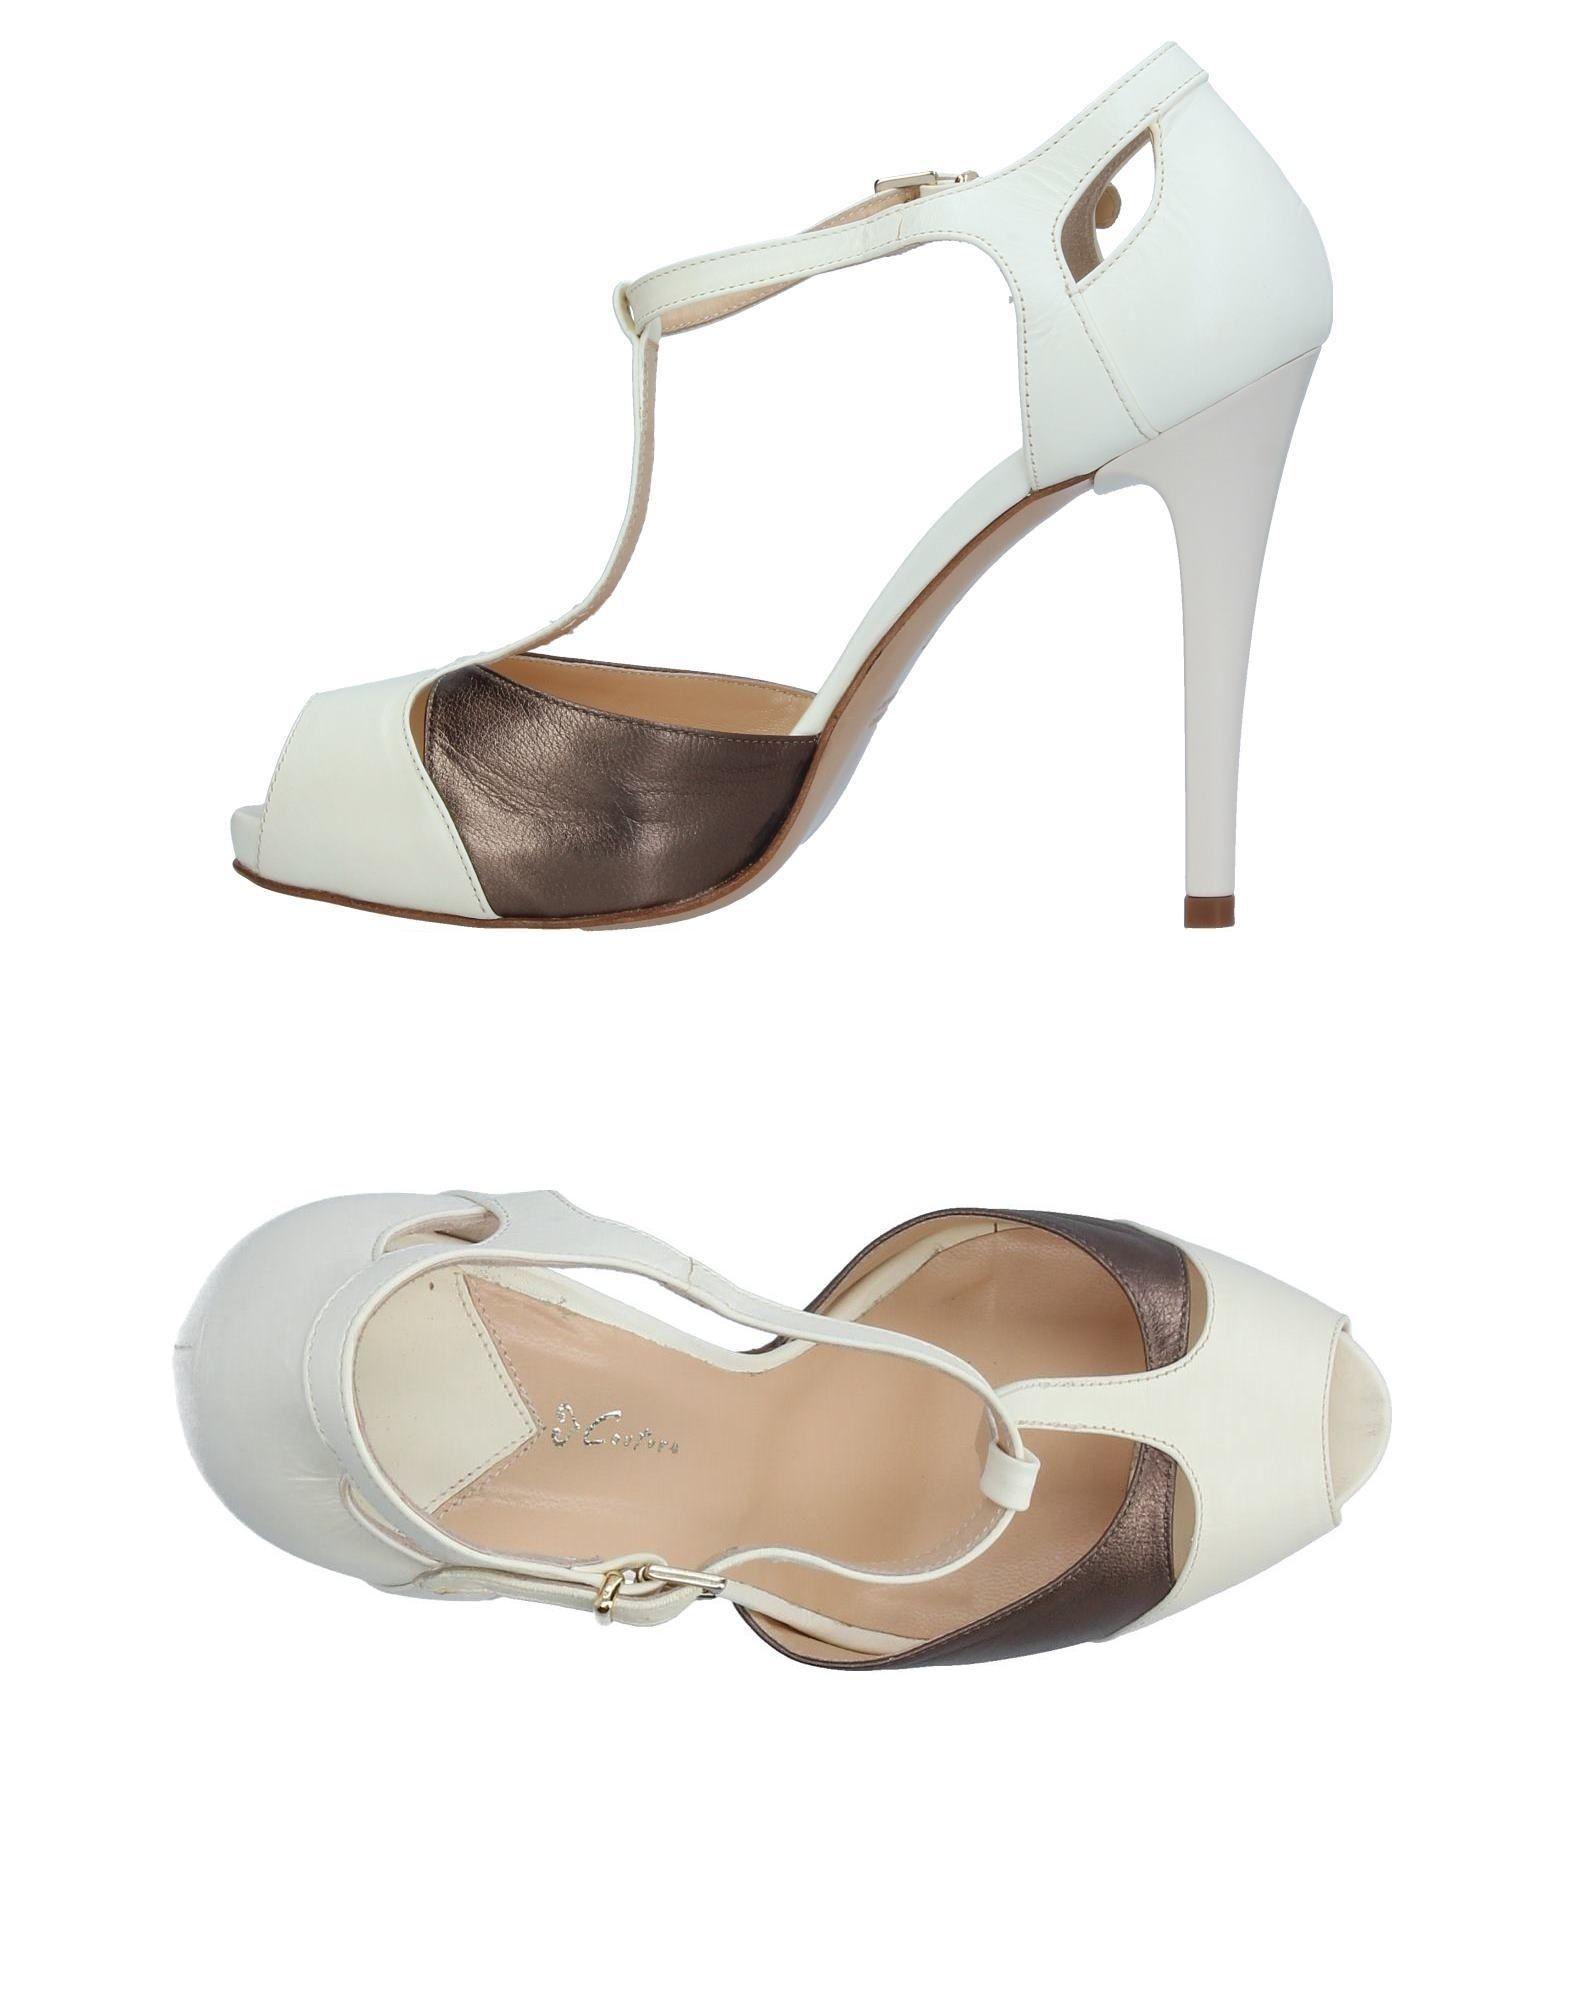 Couture Sandalen Damen  11361726JV Gute Qualität beliebte Schuhe